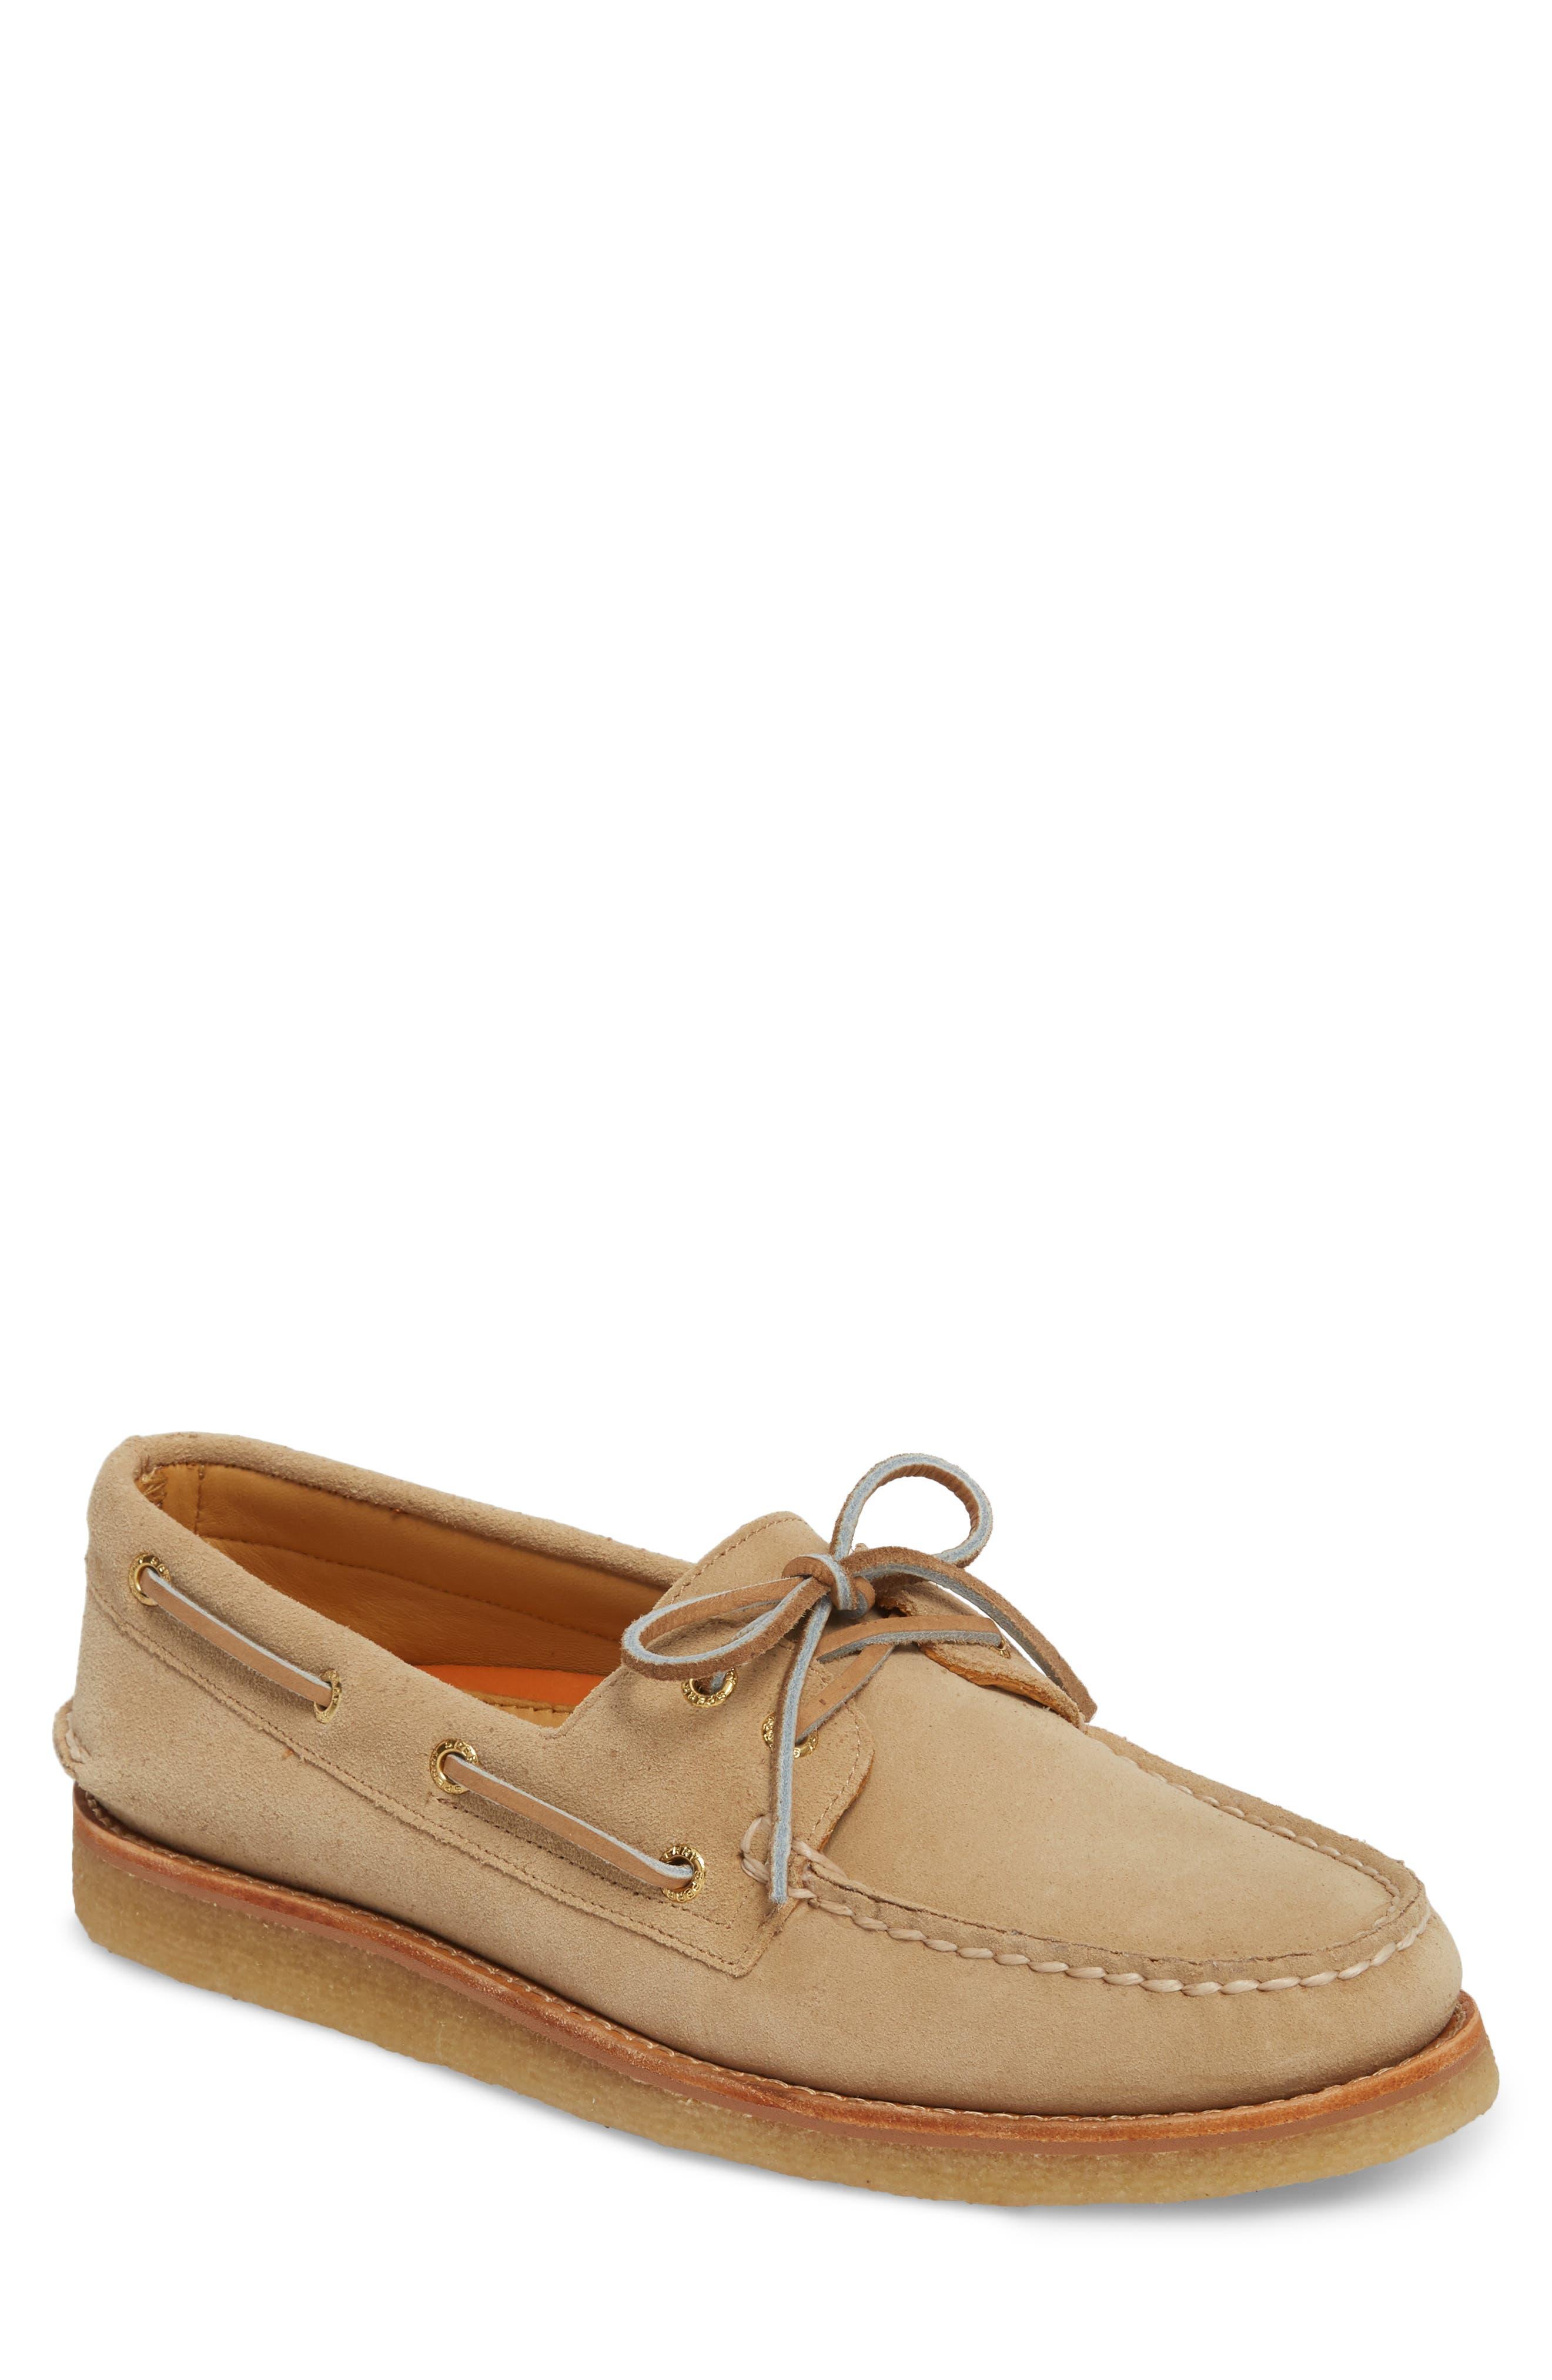 Main Image - Sperry Gold Cup AO 2-Eye Boat Shoe (Men)